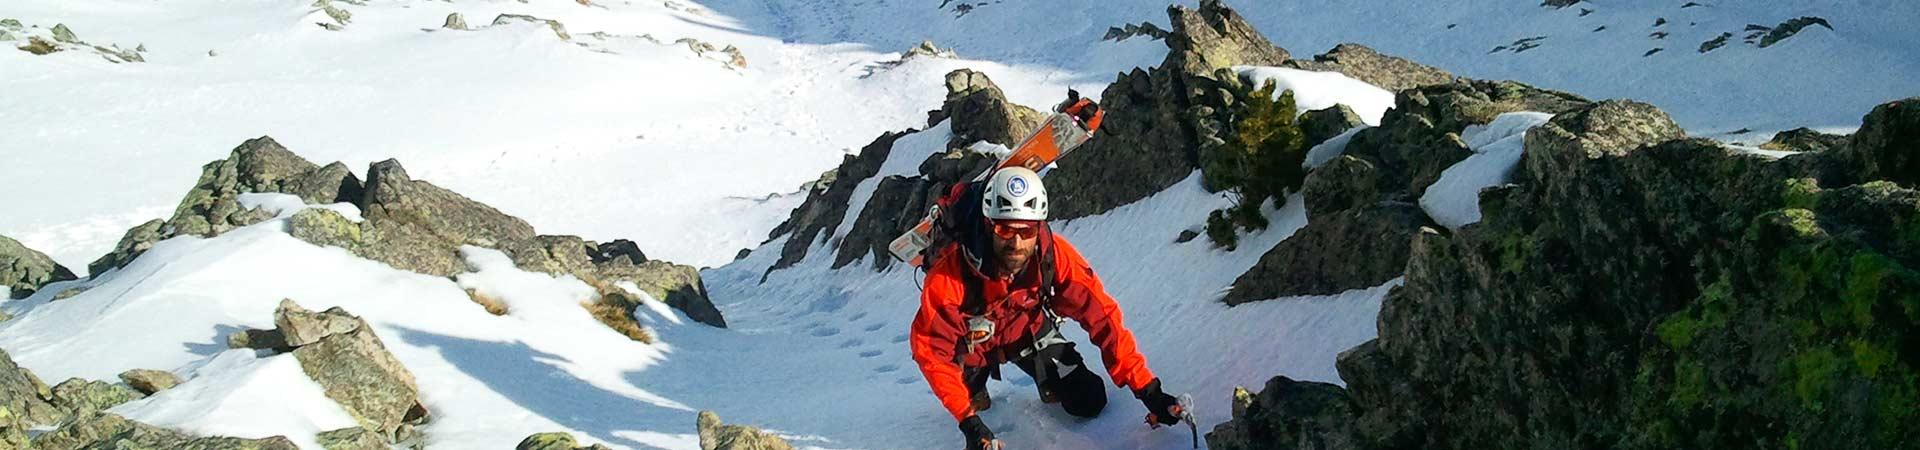 Curs-Avançat-Esquí-Muntanya-4-Dies